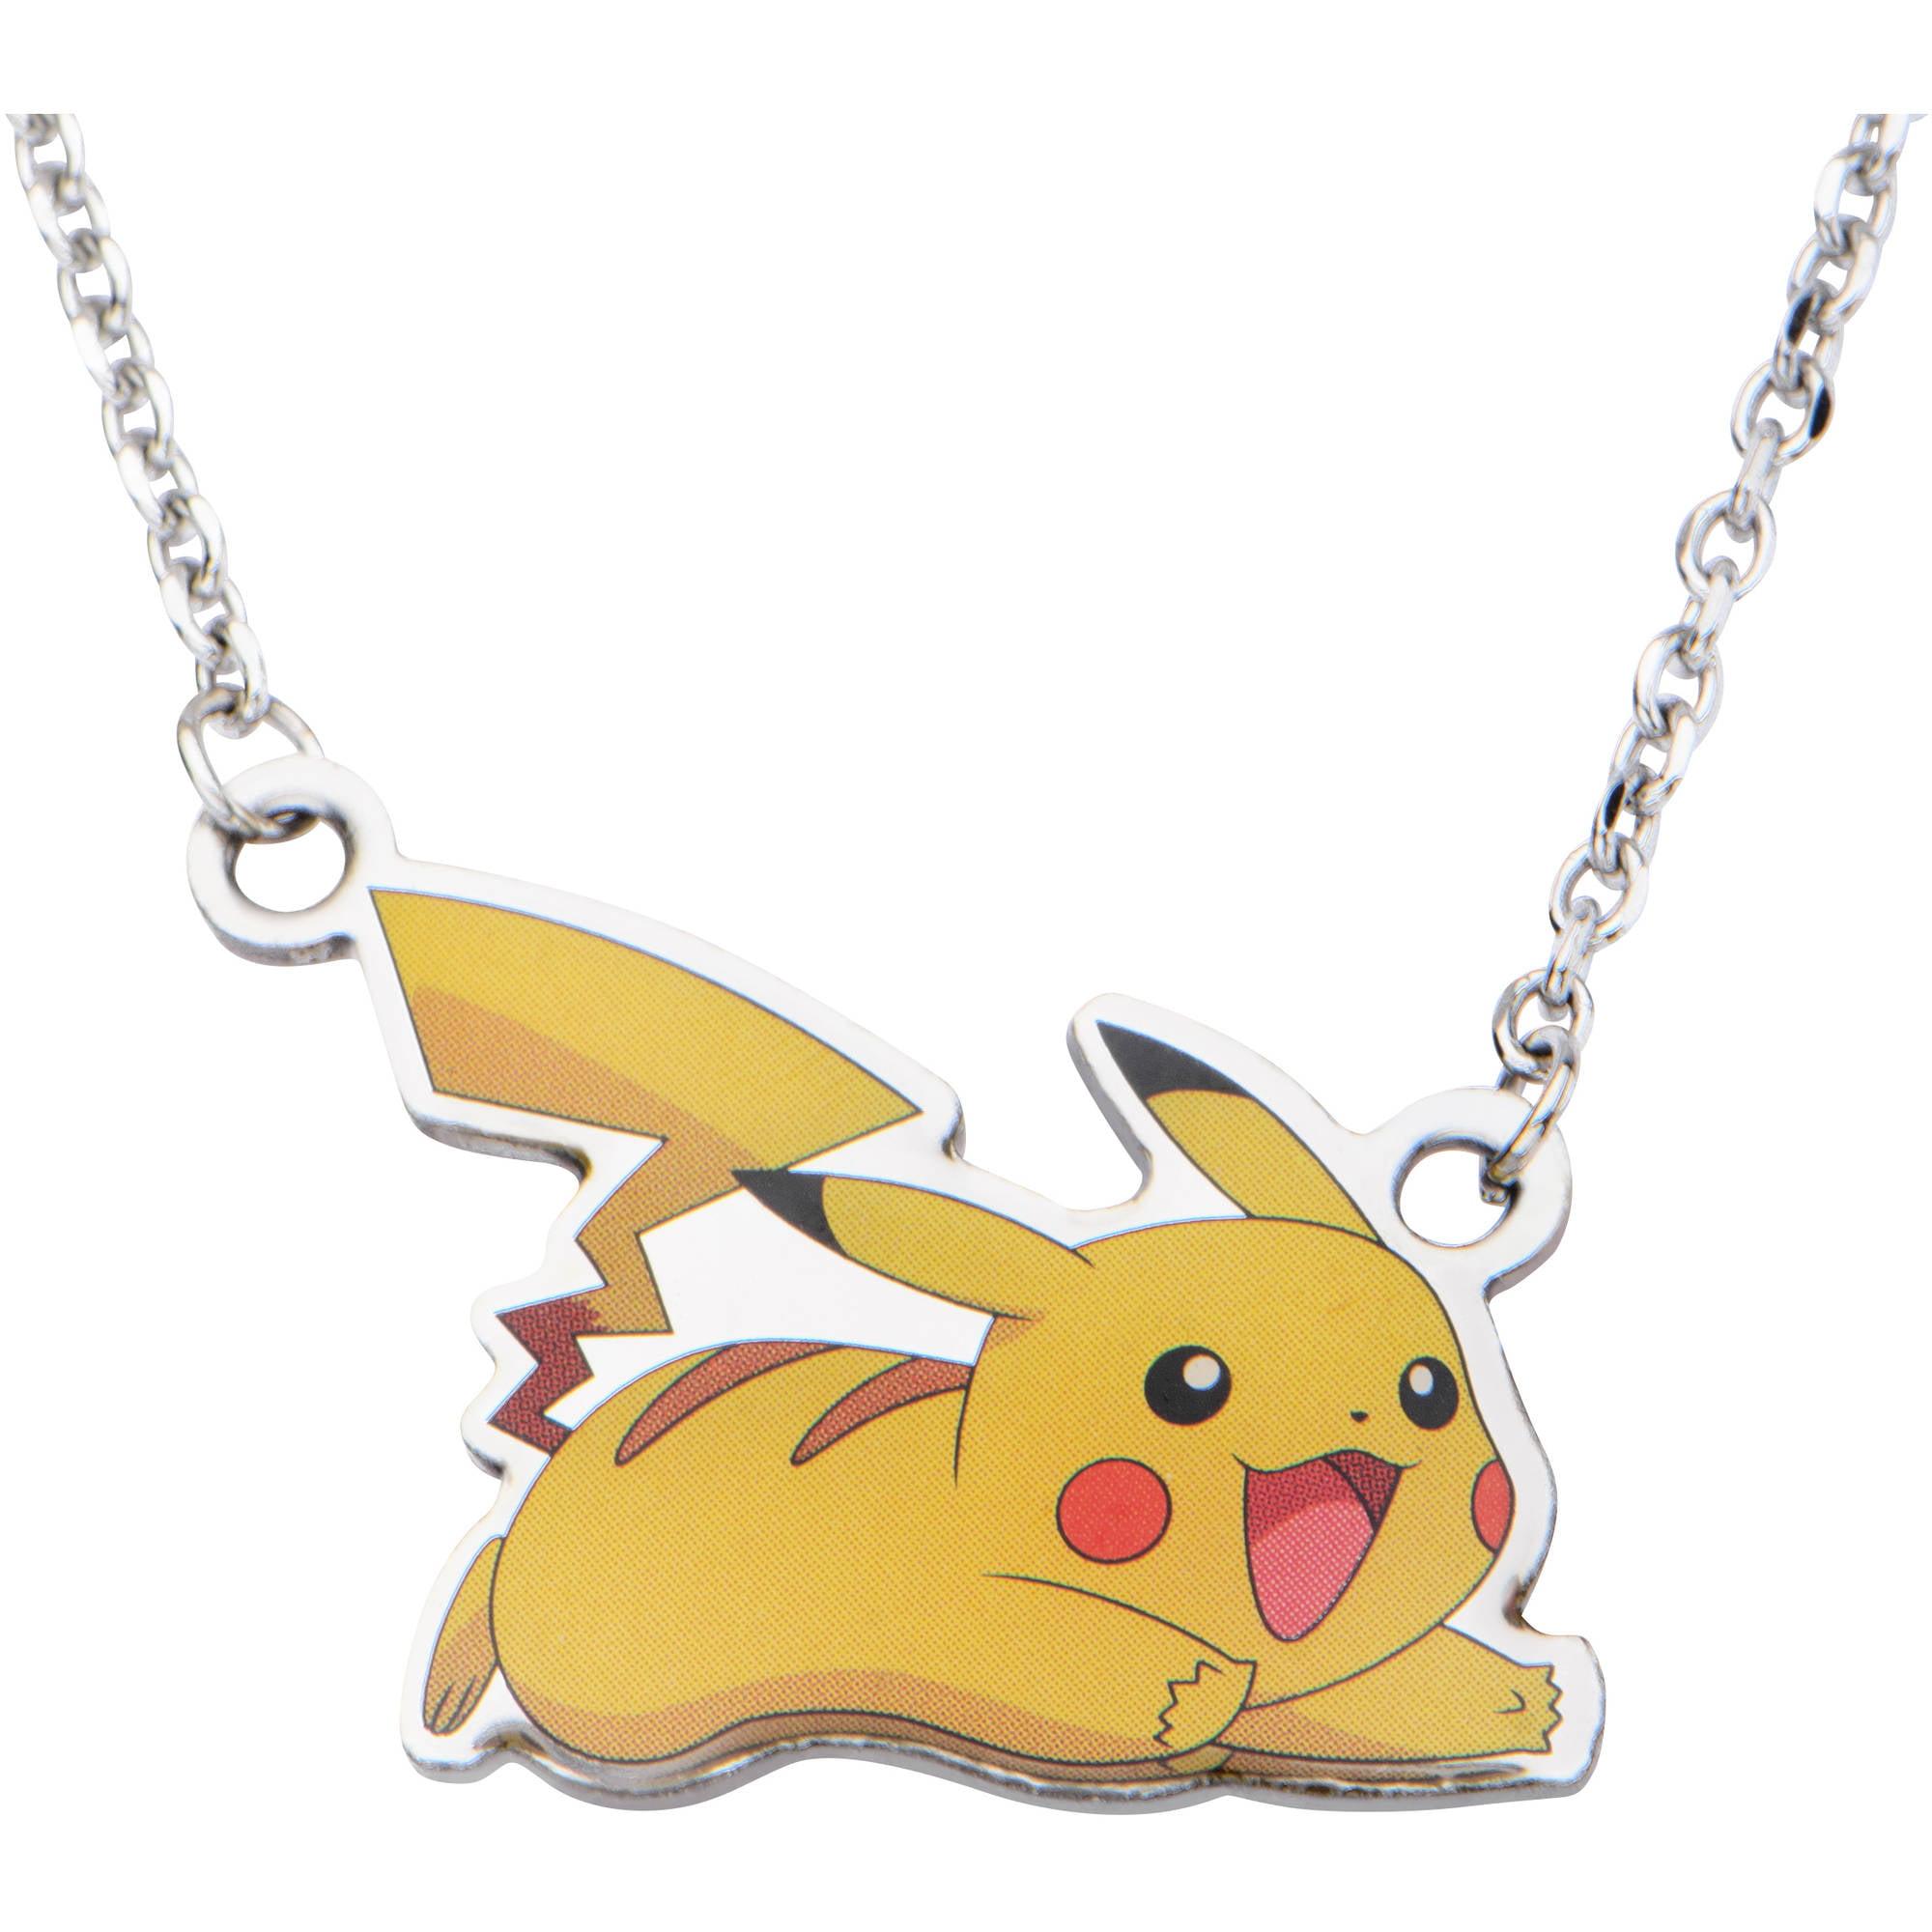 "Pokemon Kids' Stainless Steel Pikachu Pendant, 16"" Chain"